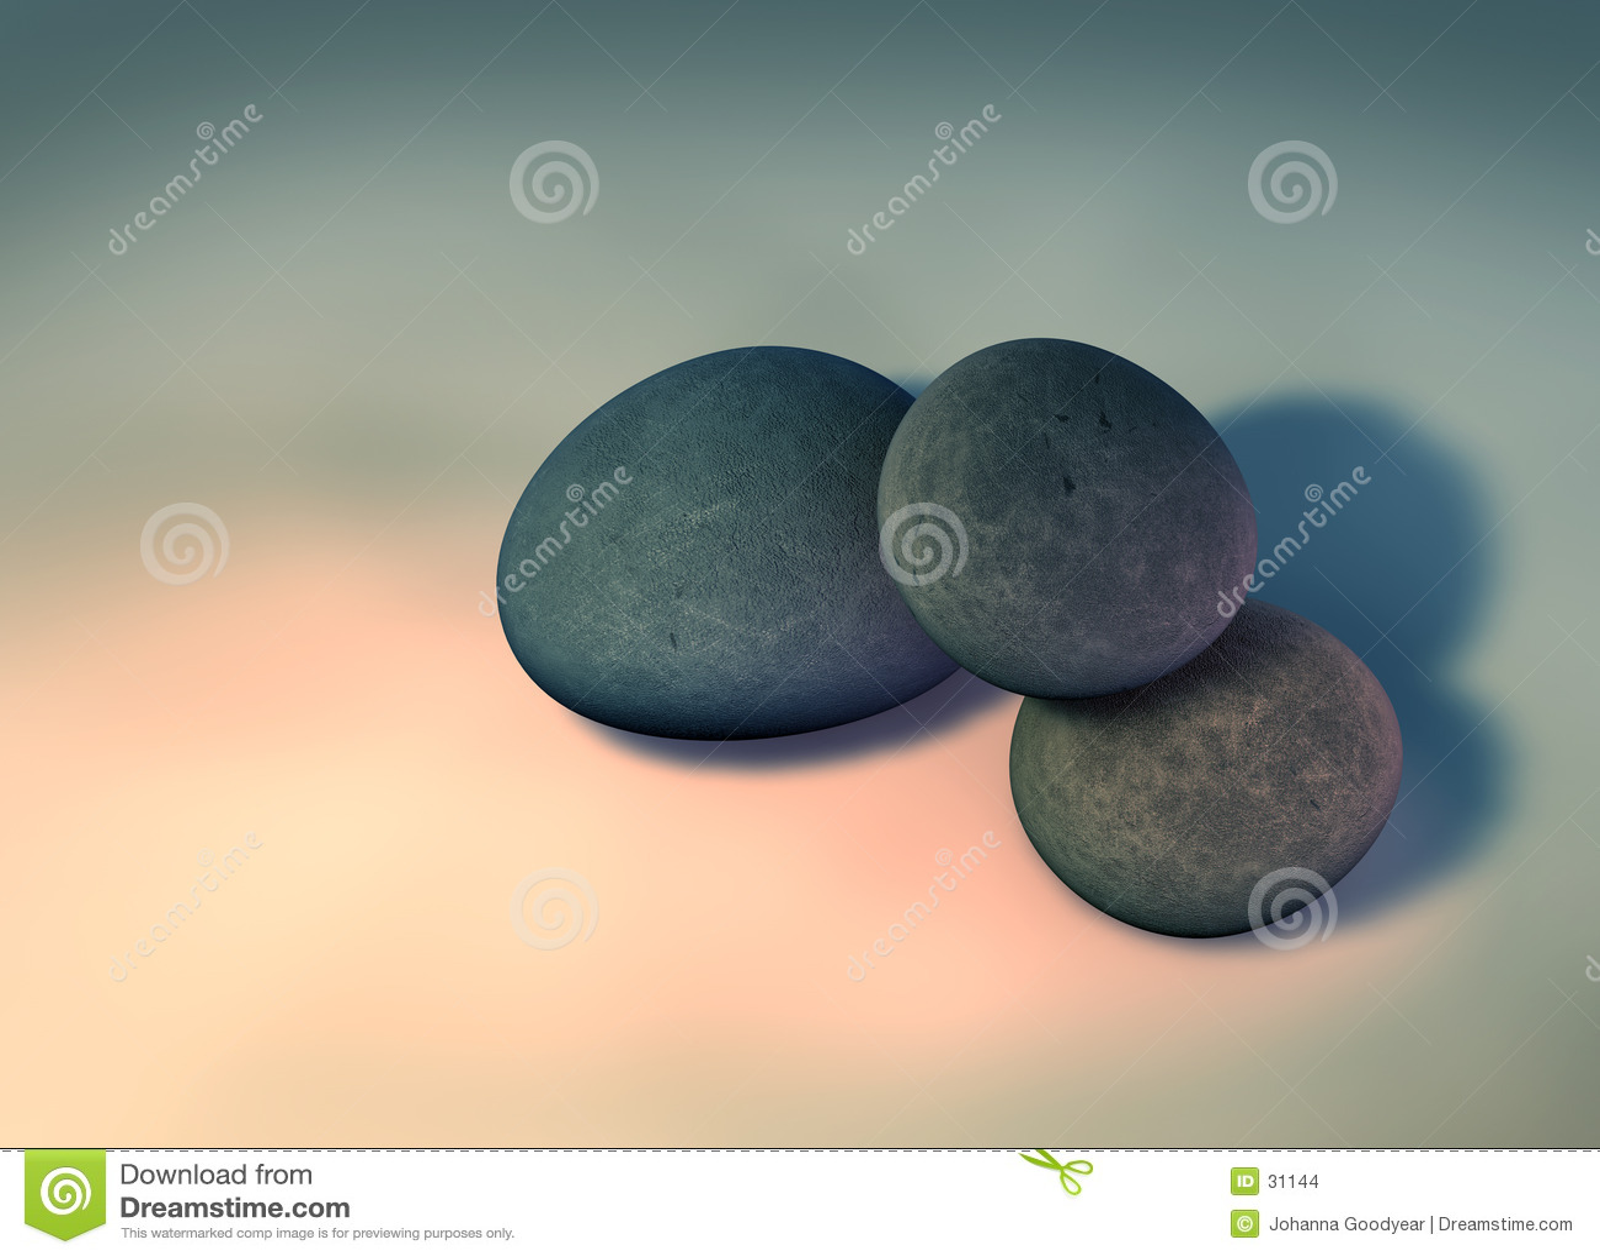 2 kamień